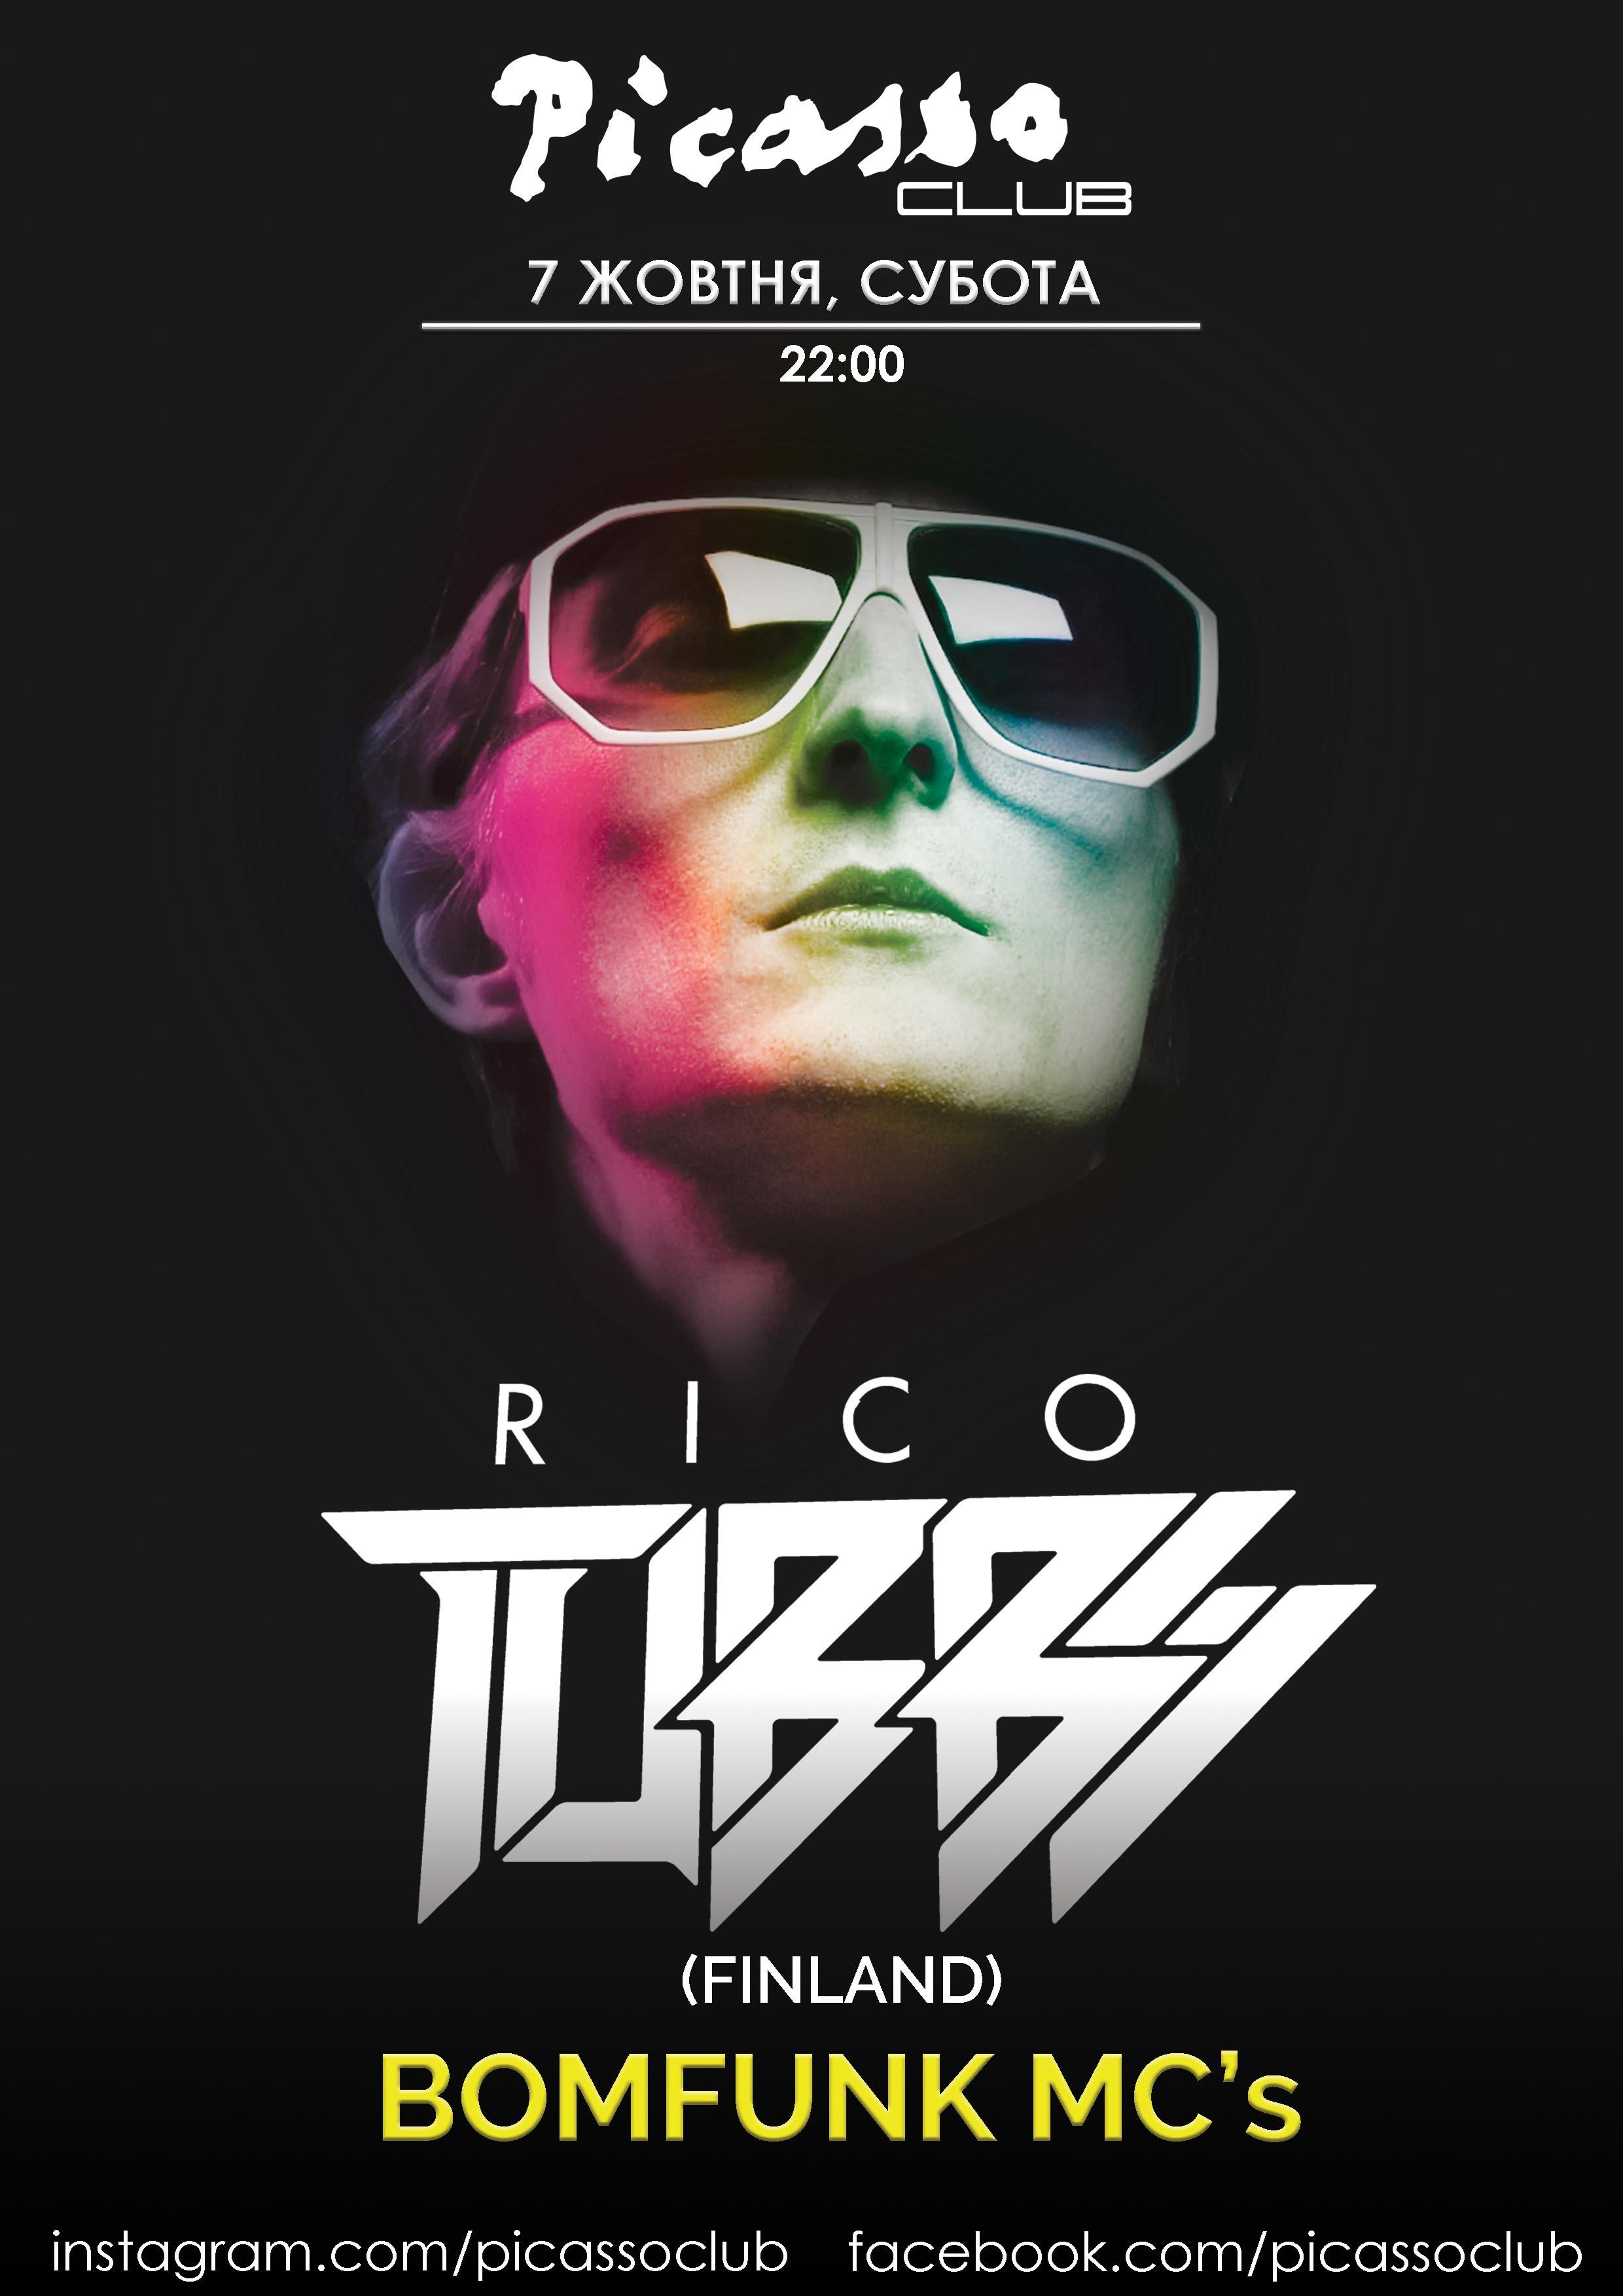 Dj Rico Tubbs (Bomfunk MC's)